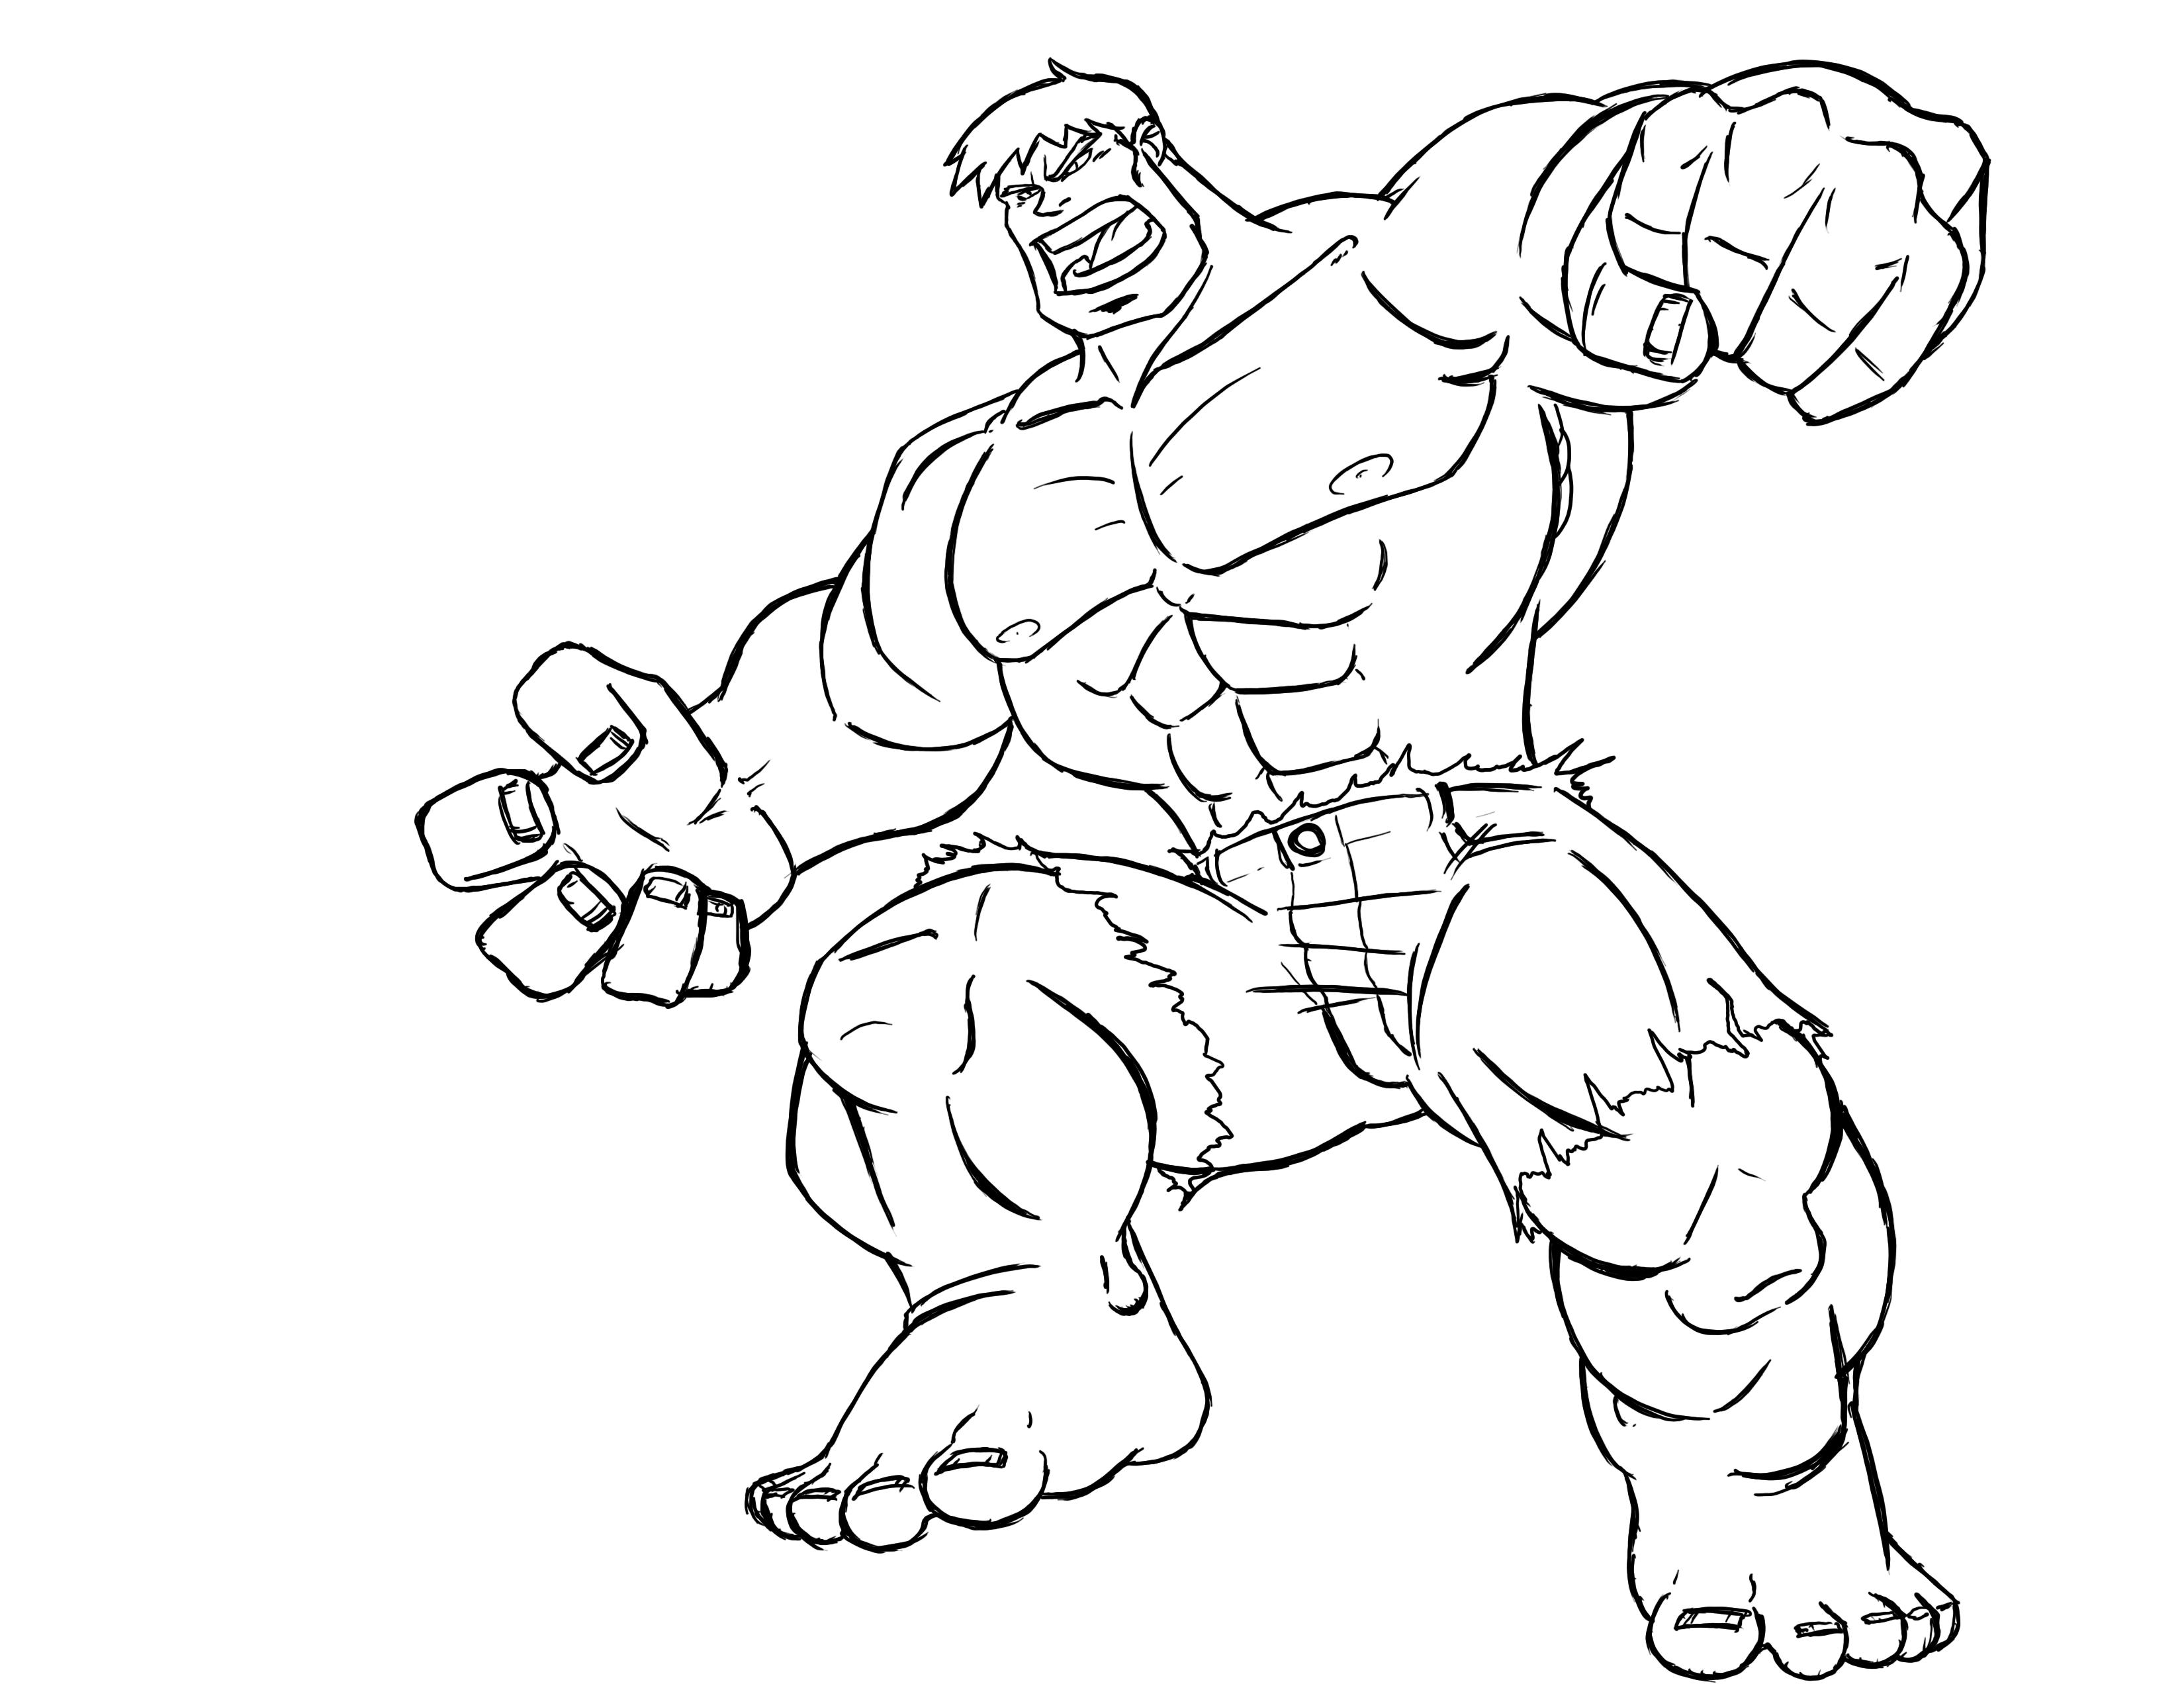 Wallpaper Incredible Hulk Cartoon Drawing Superhero Coloring Pages Superhero Coloring Avengers Coloring Pages